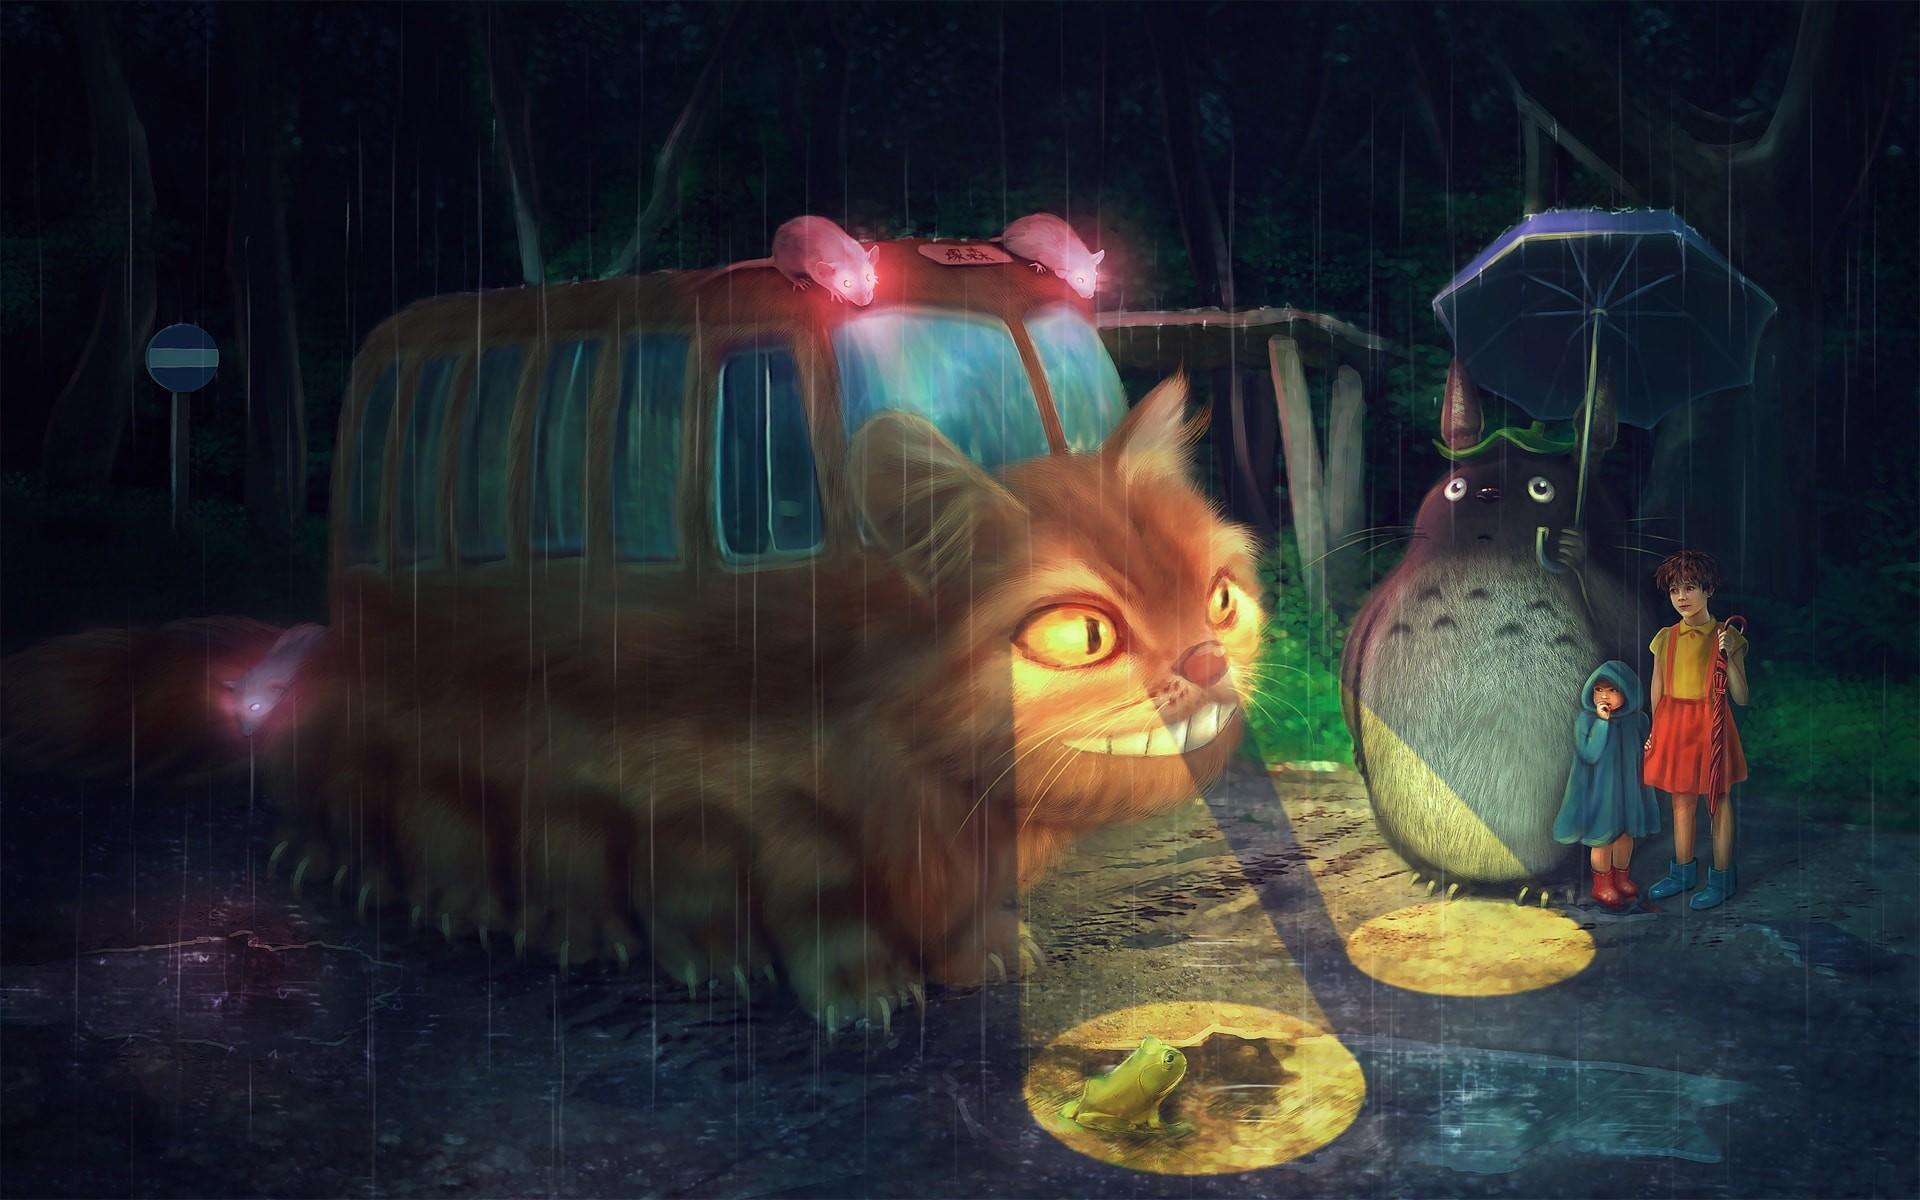 My Neighbor Totoro Wallpaper 64 Pictures